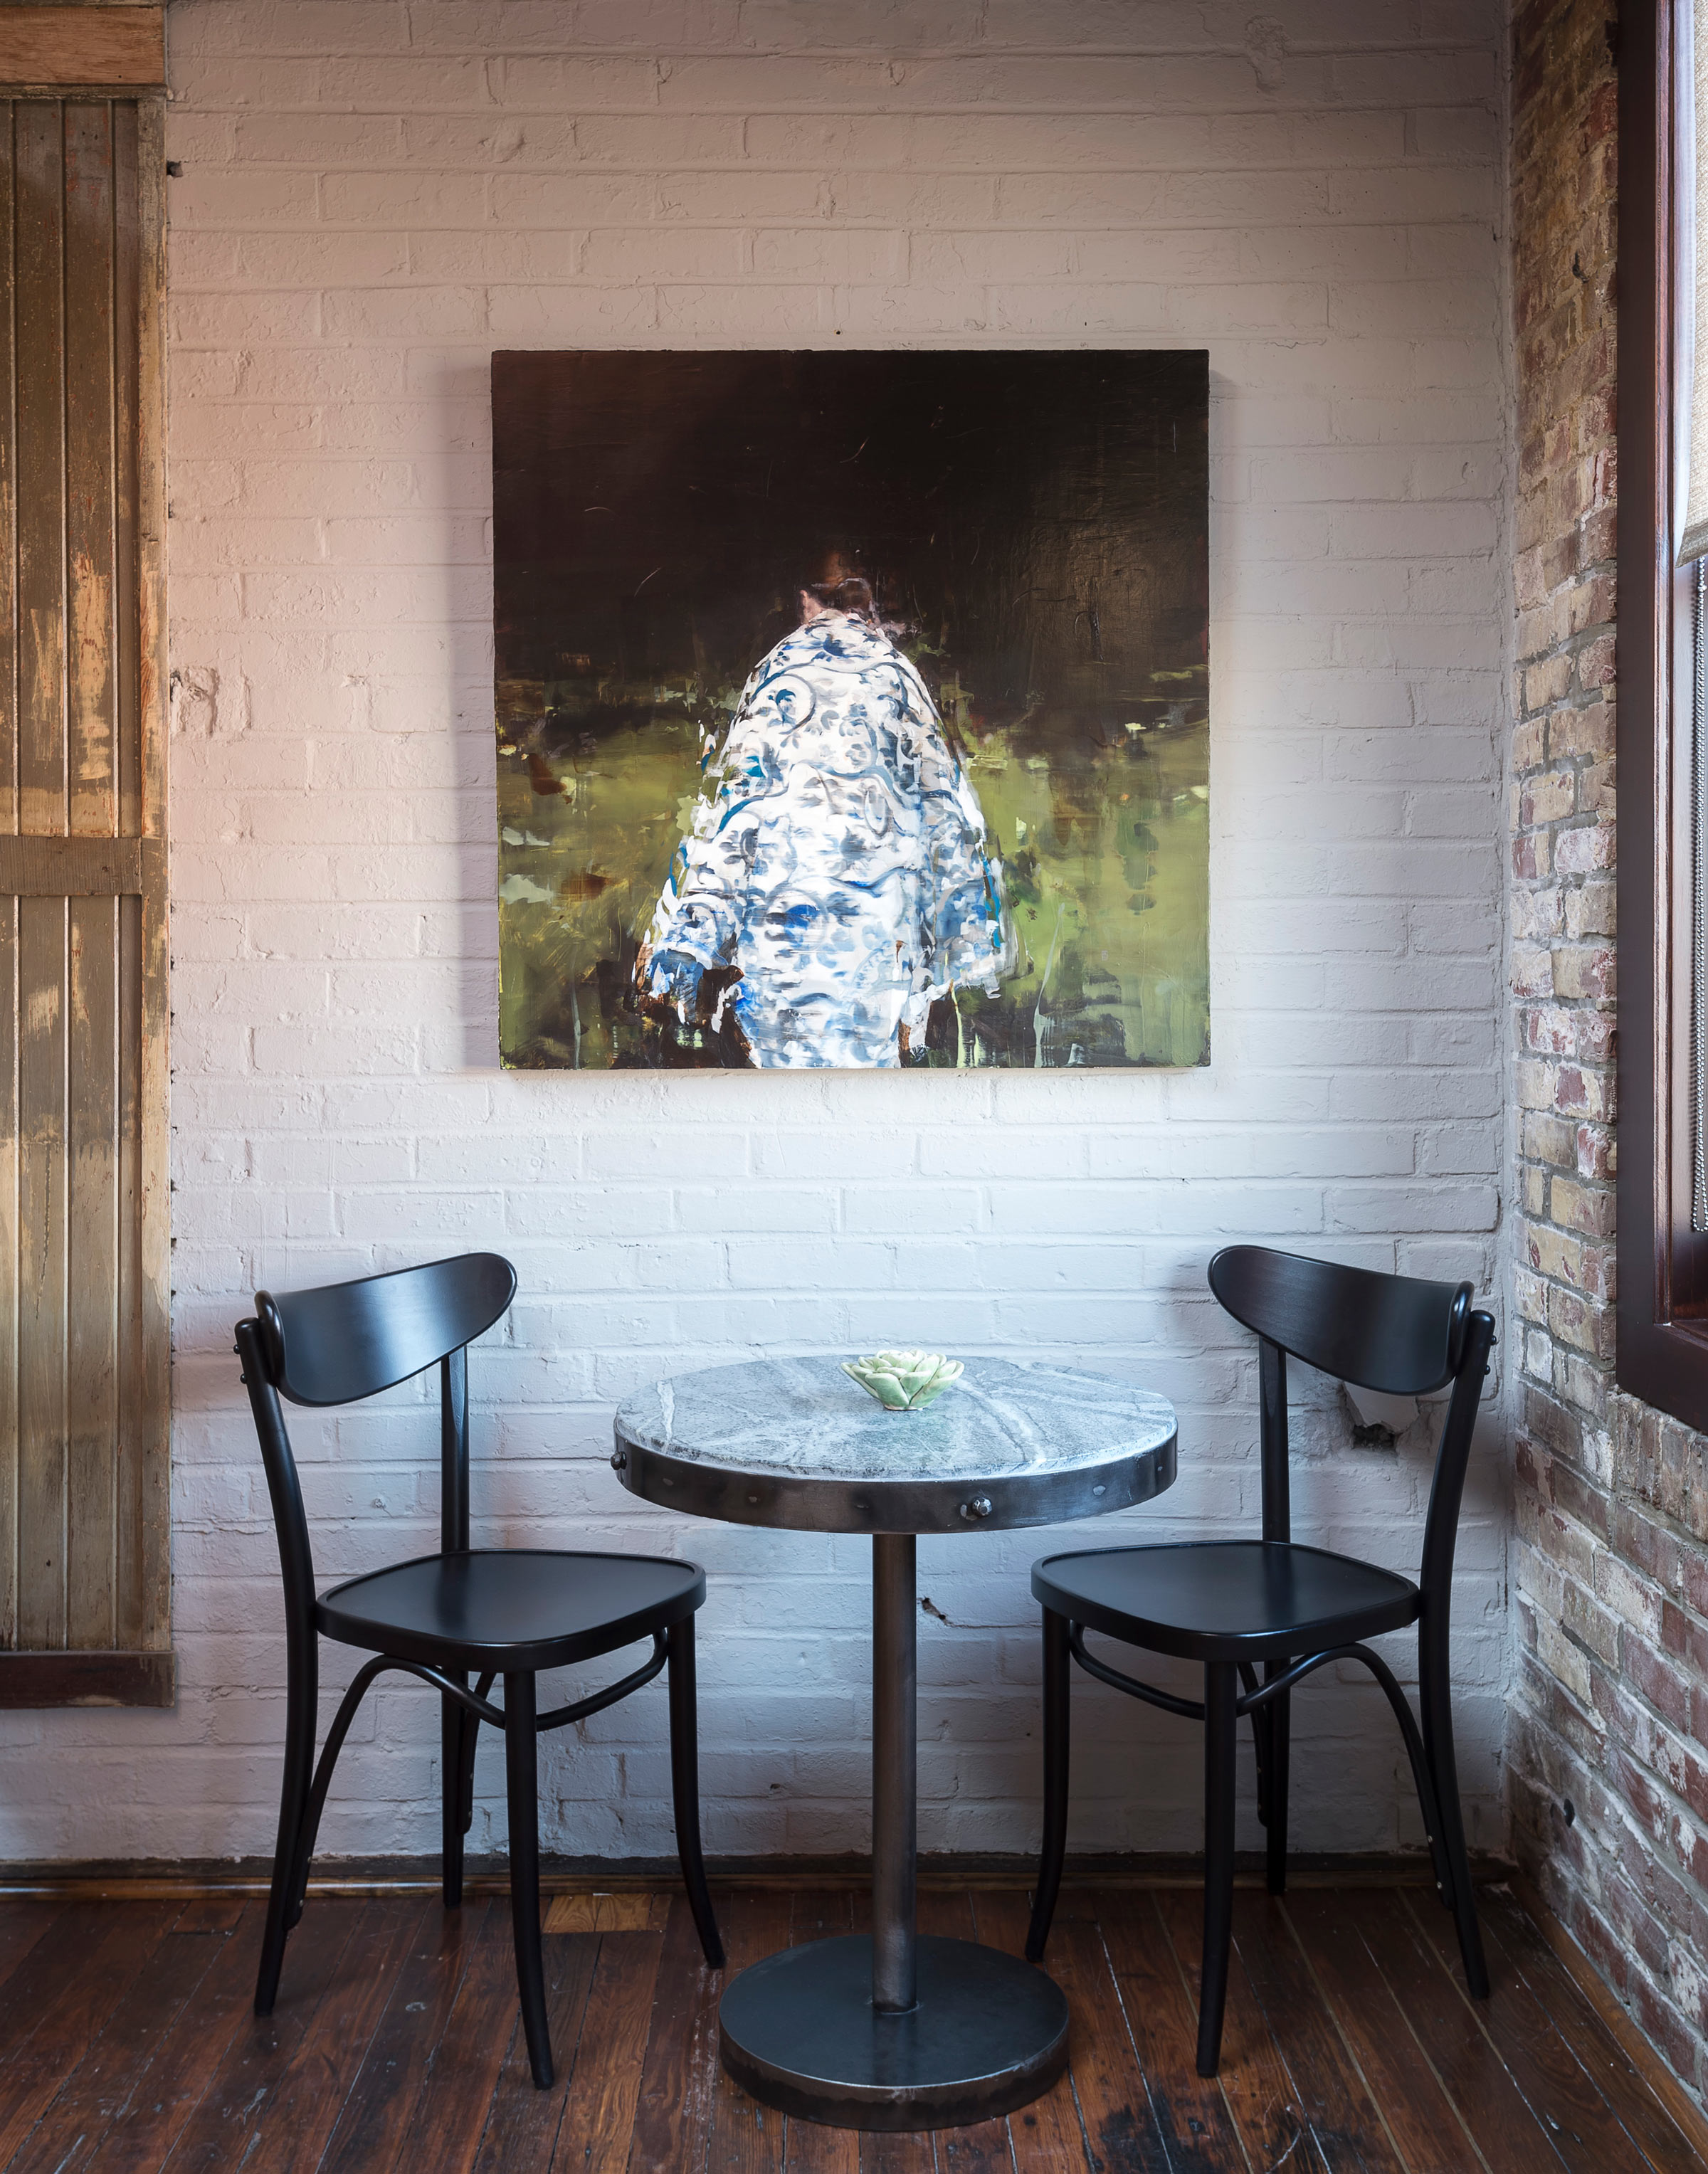 Wm.-Mulherin_s-Sons-Hotel---Room-4-dining---by-Matthew-Williams.jpg